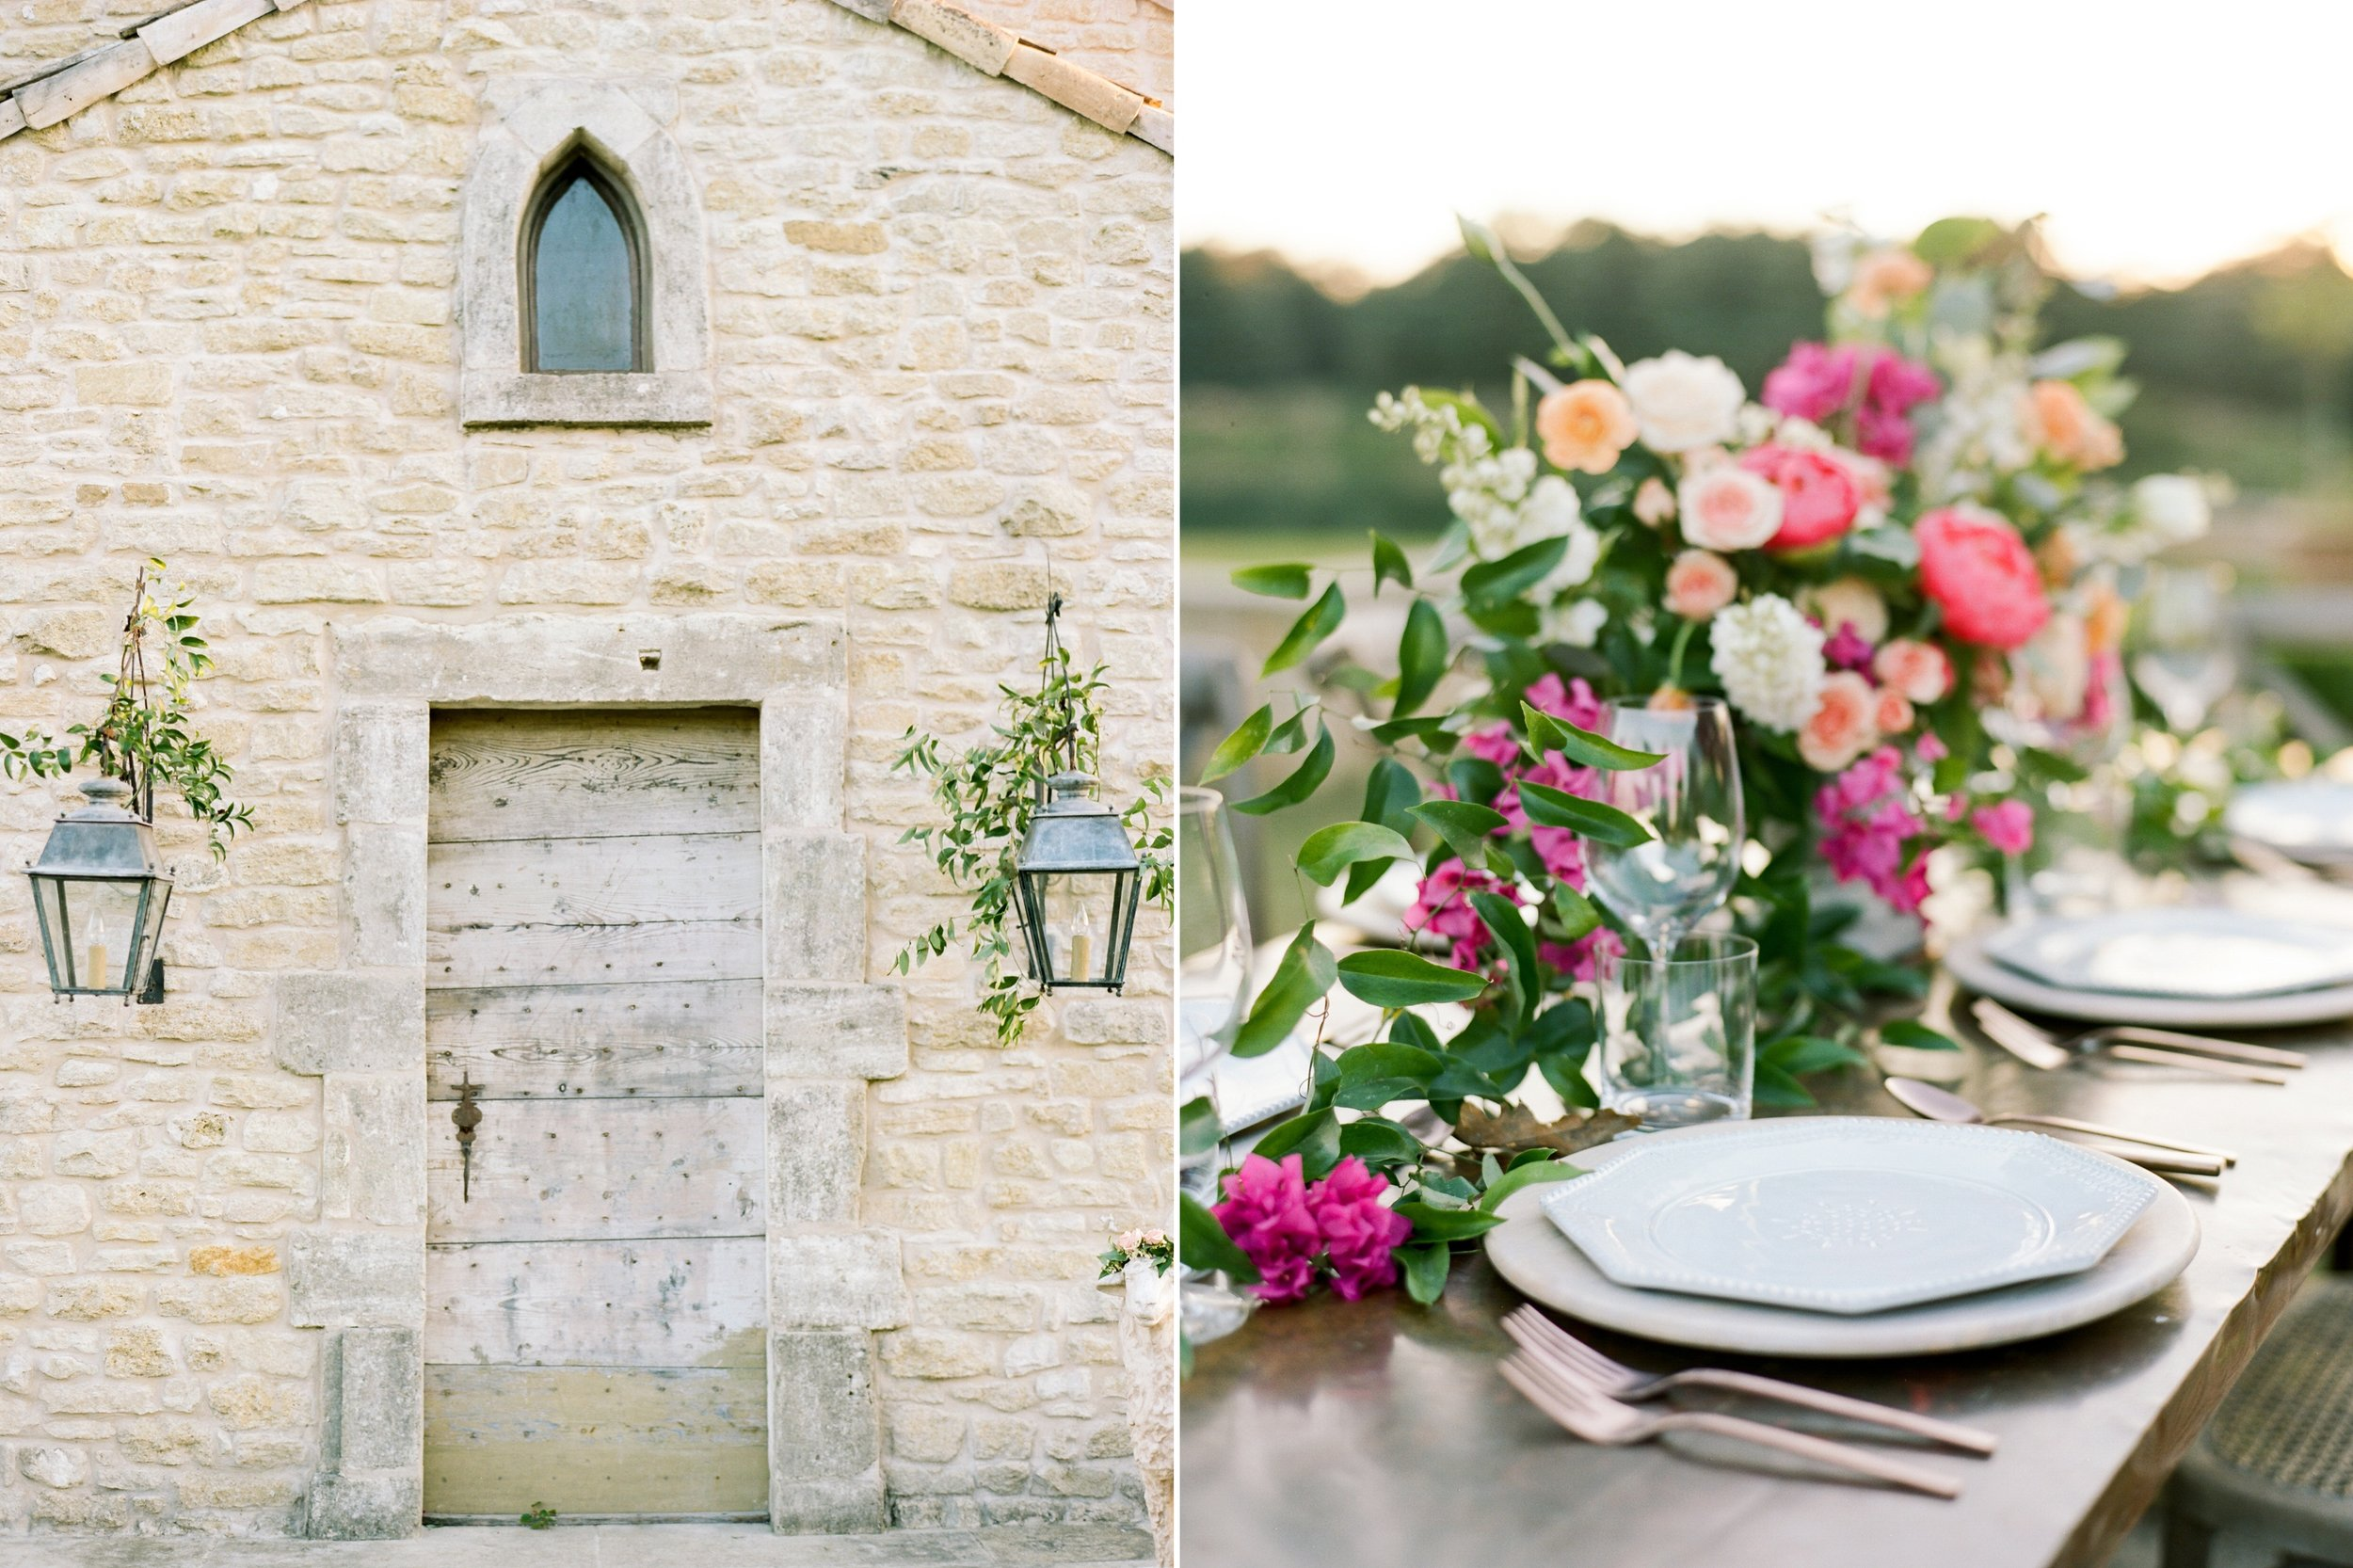 the-clubs-at-houston-oaks-wedding-houston-oaks-wedding-ceremony-houston-oaks-chapel-belle-of-the-ball-dana-fernandez-photography-houston-wedding-photographer-luxury-film-fine-art.jpg